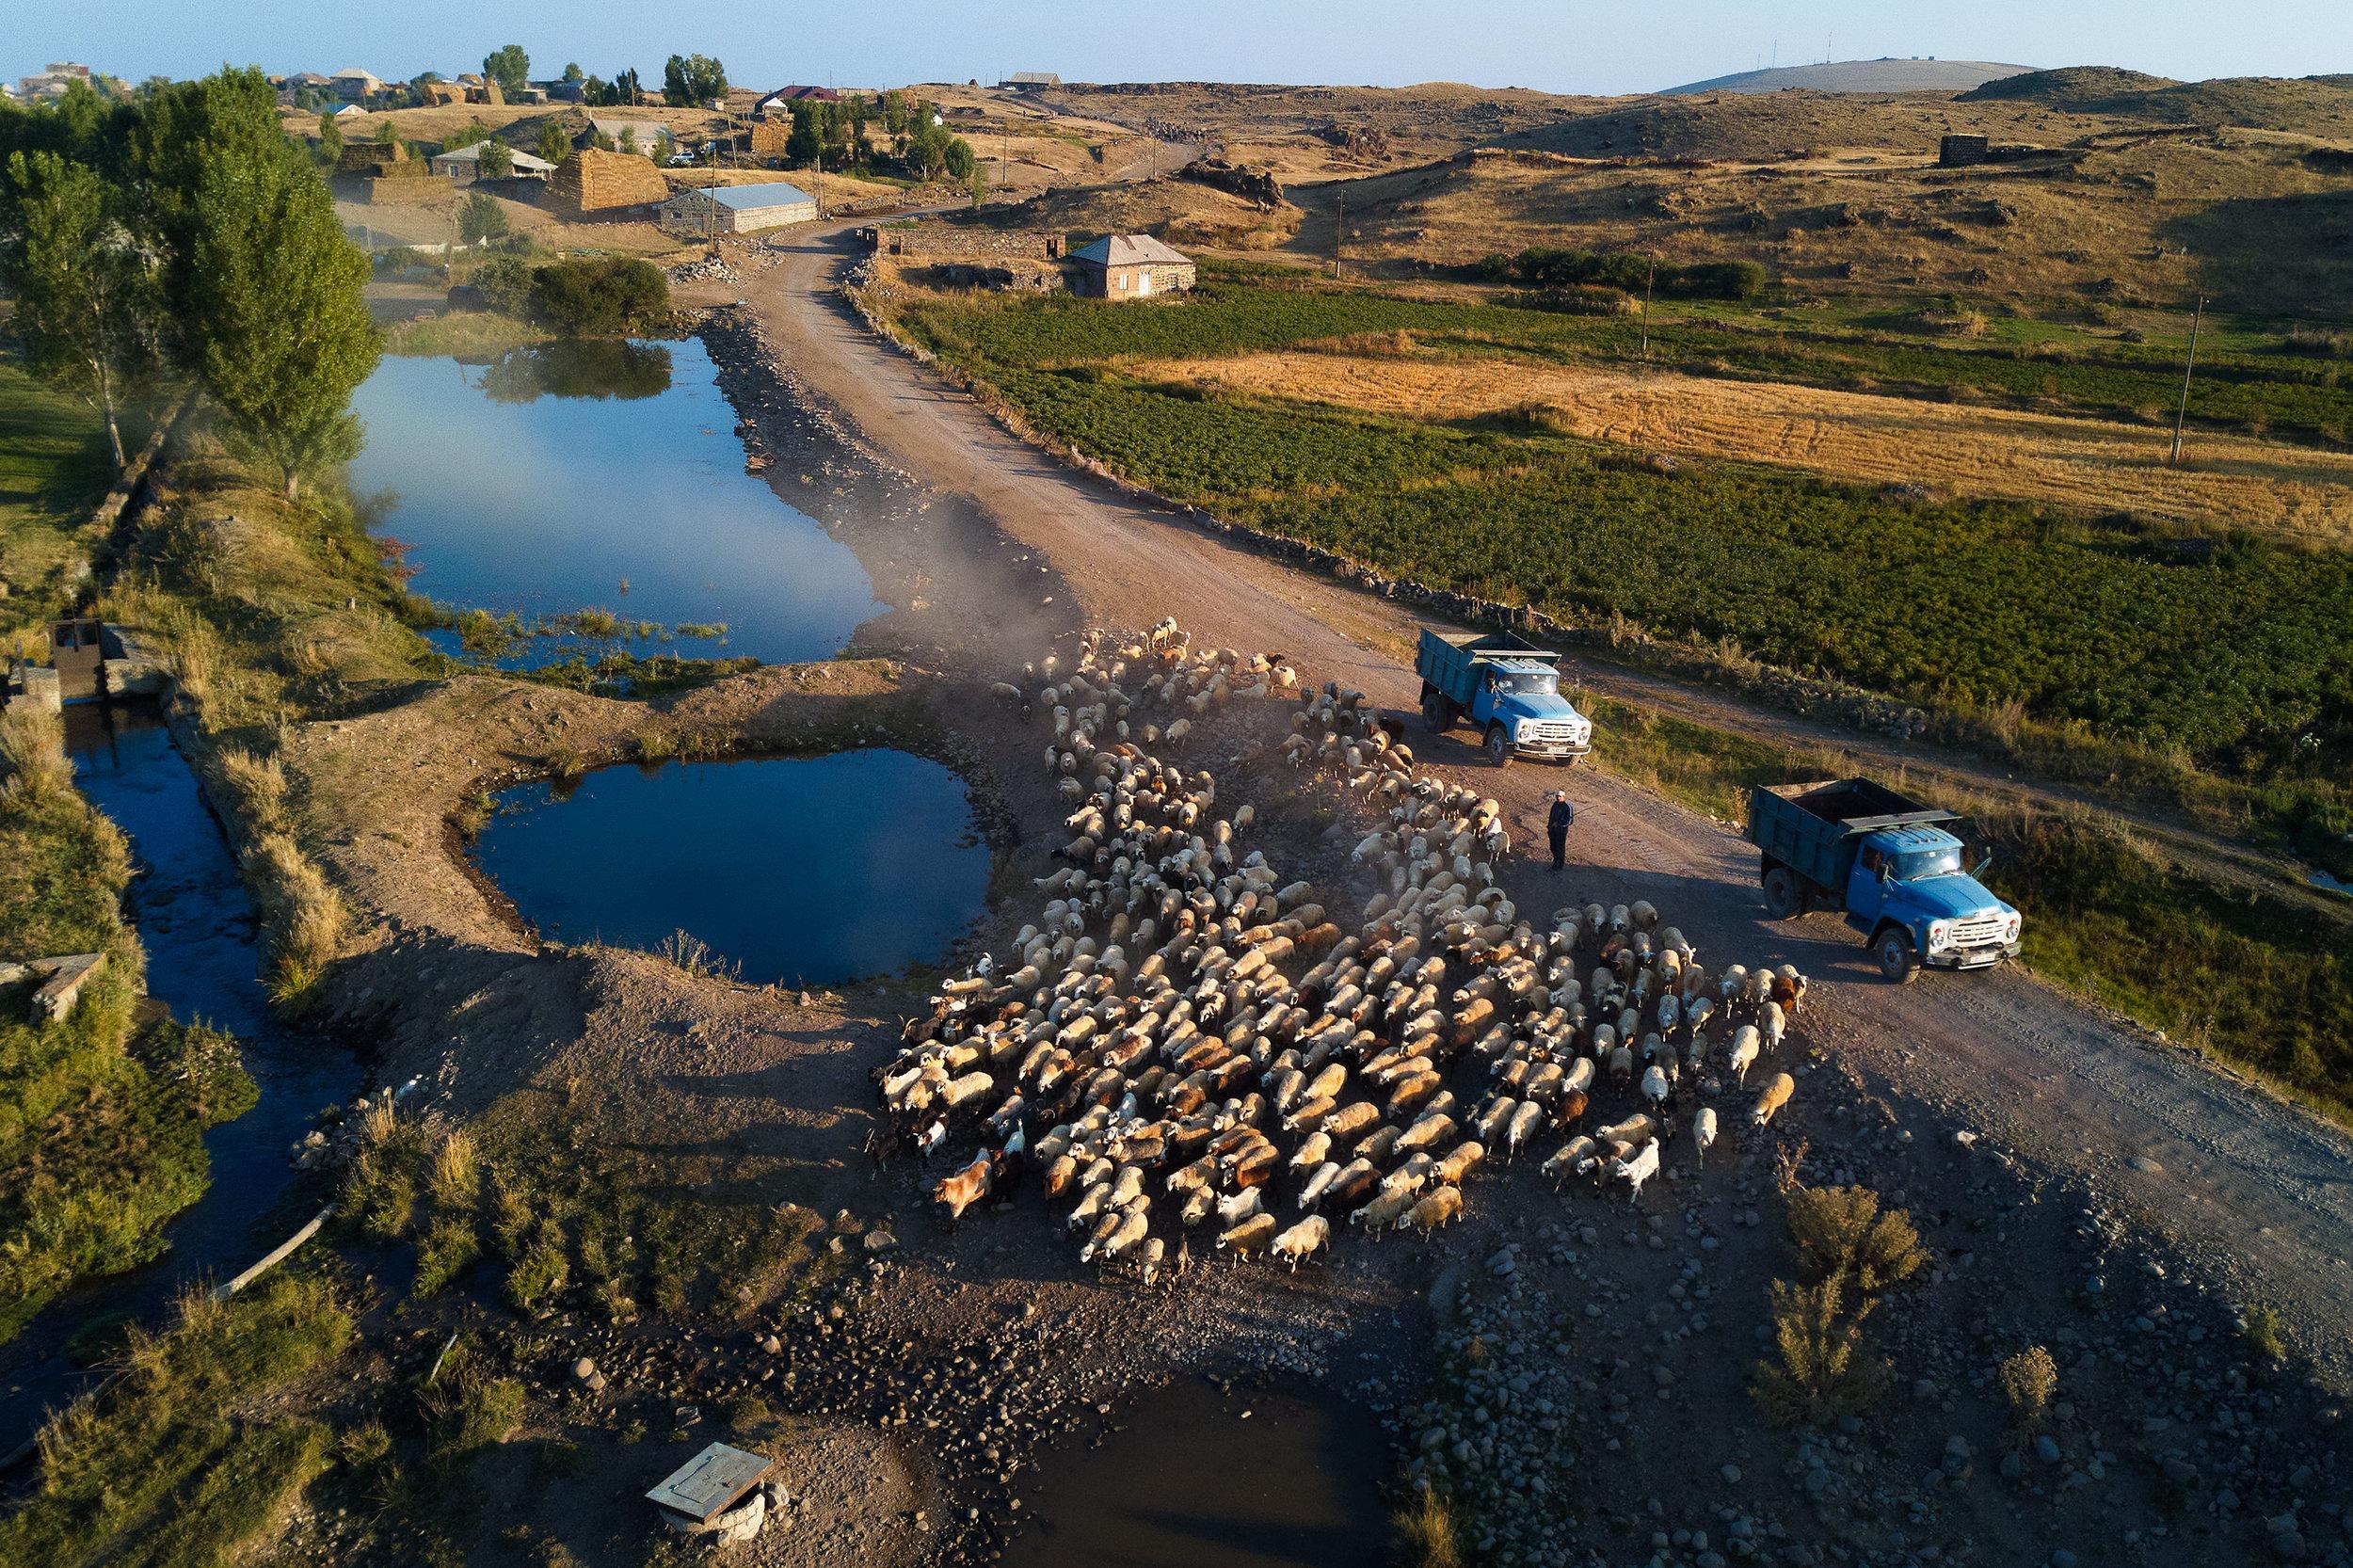 Armenia-mountains-sheep-cows-soviet-cars